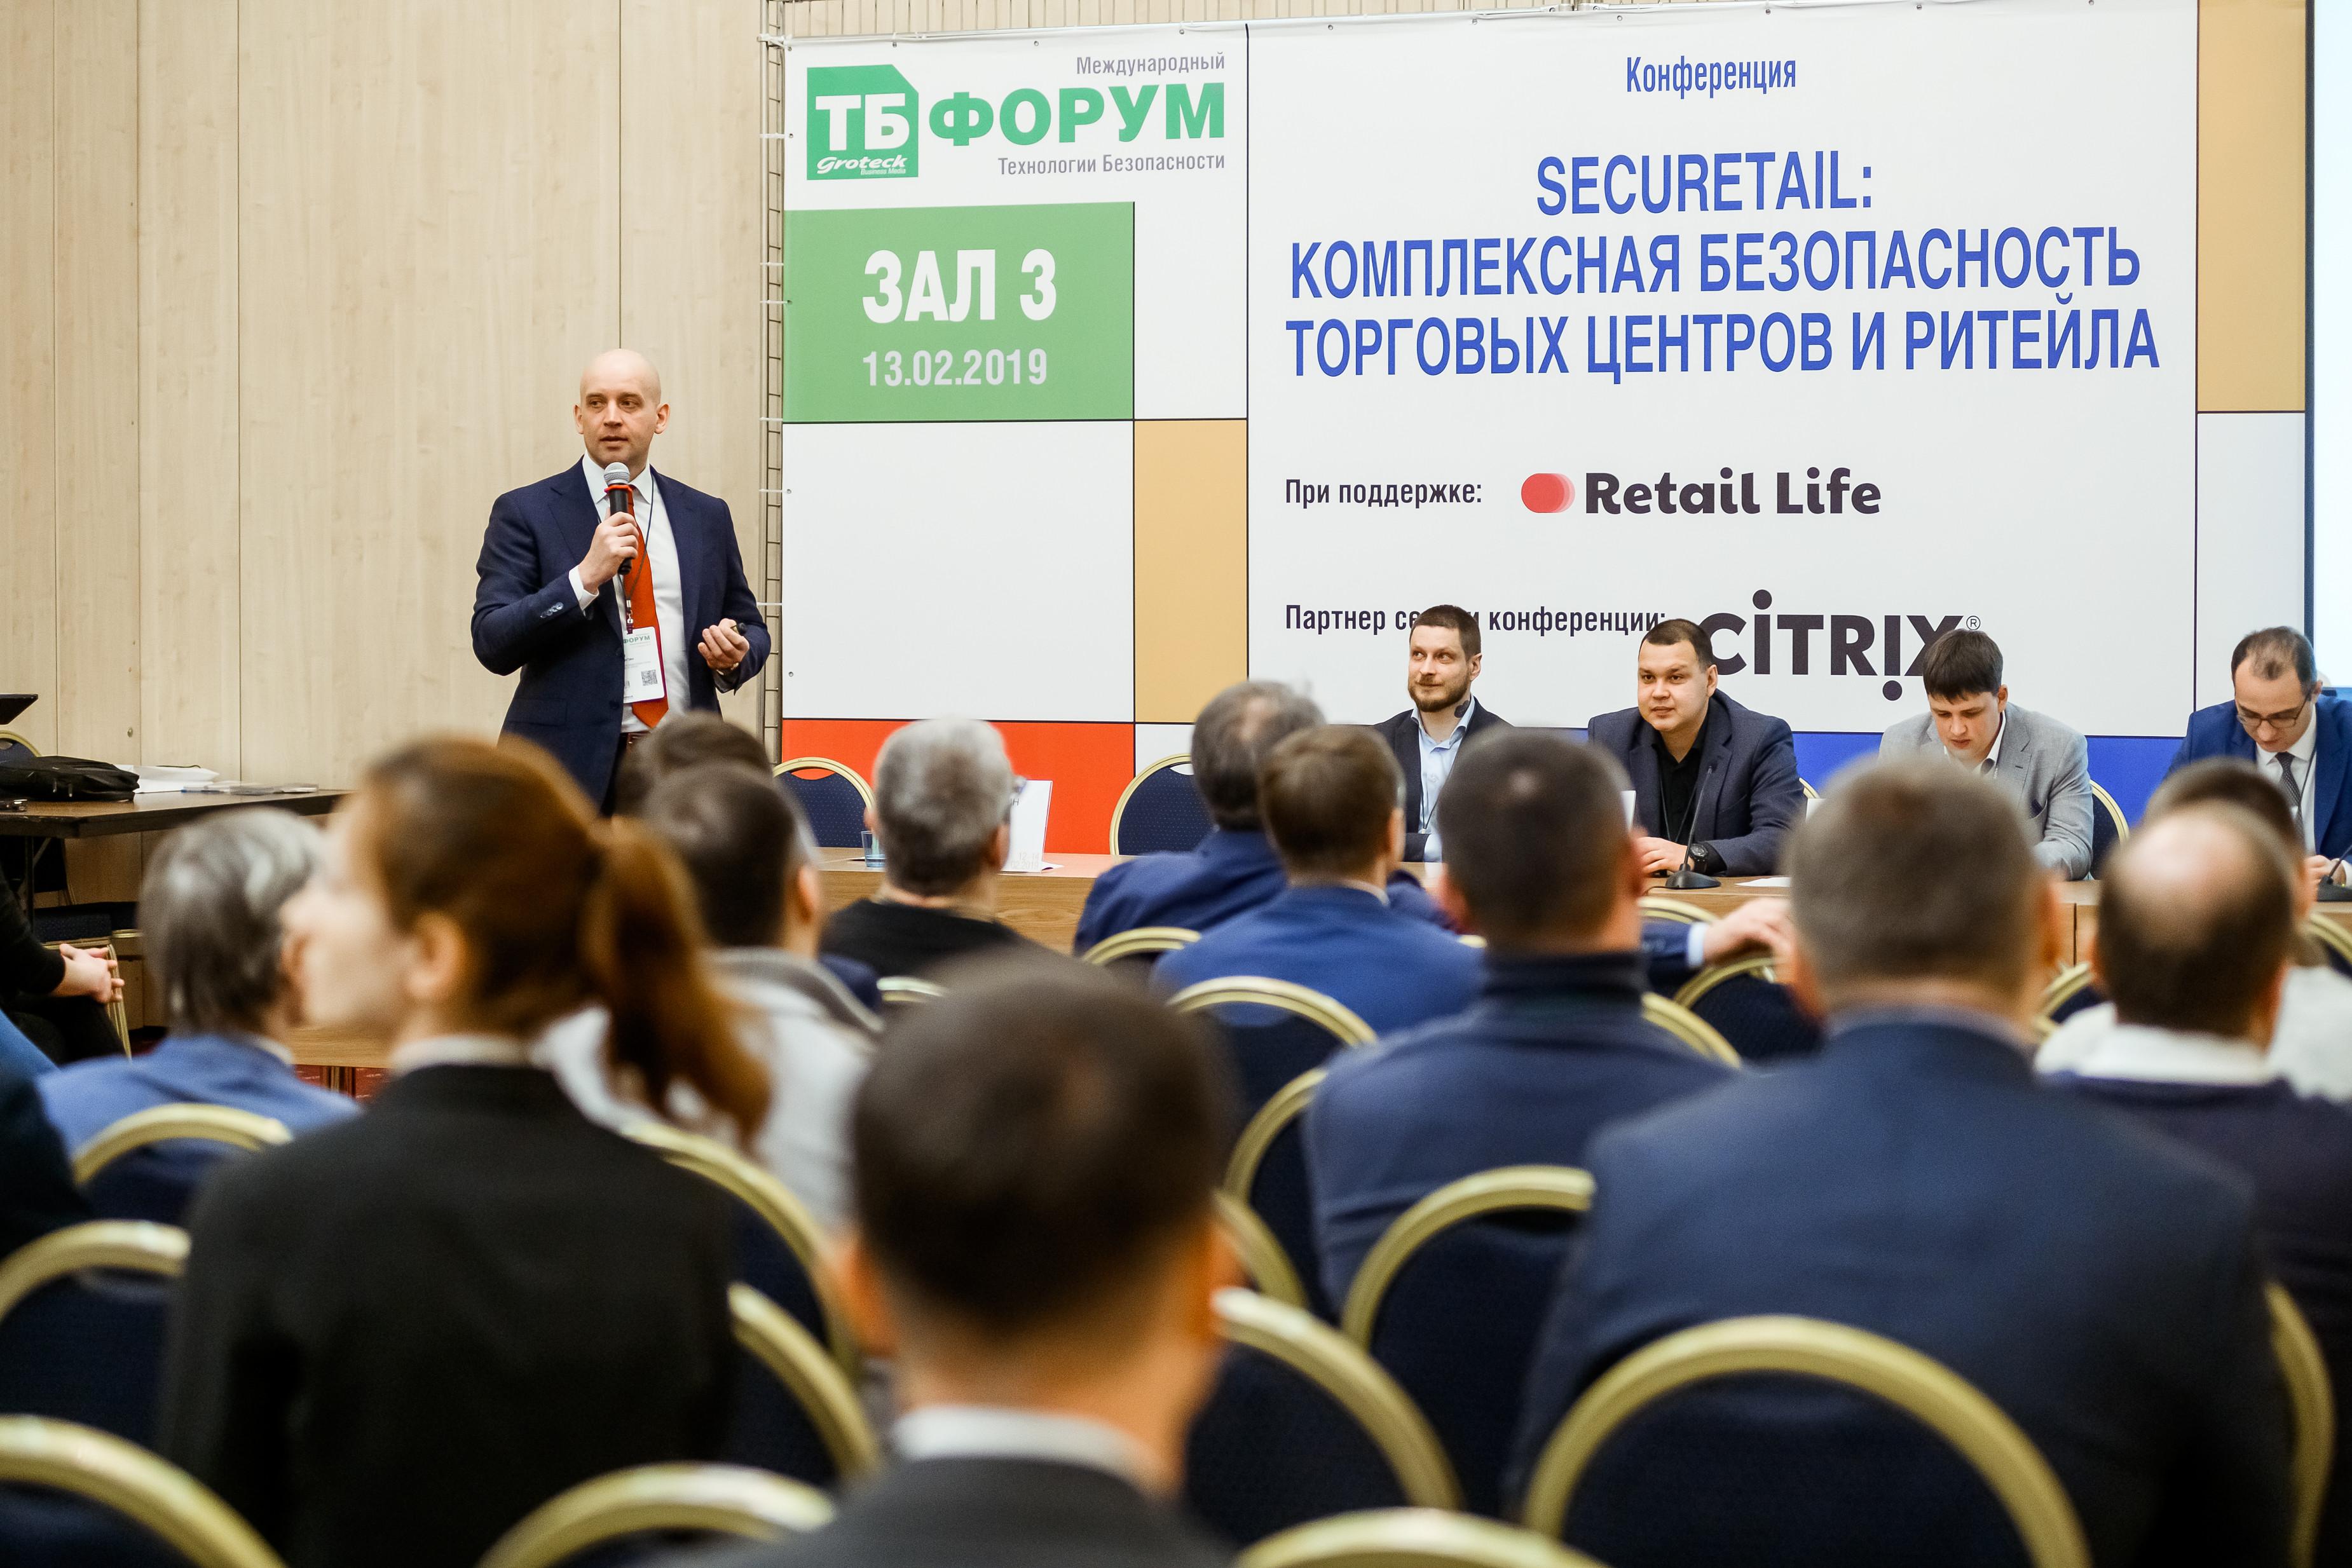 Монетка, METRO Cash and Carry и OBI обсудят вопросы цифровизации в ритейле в рамках конференции SecuRetail